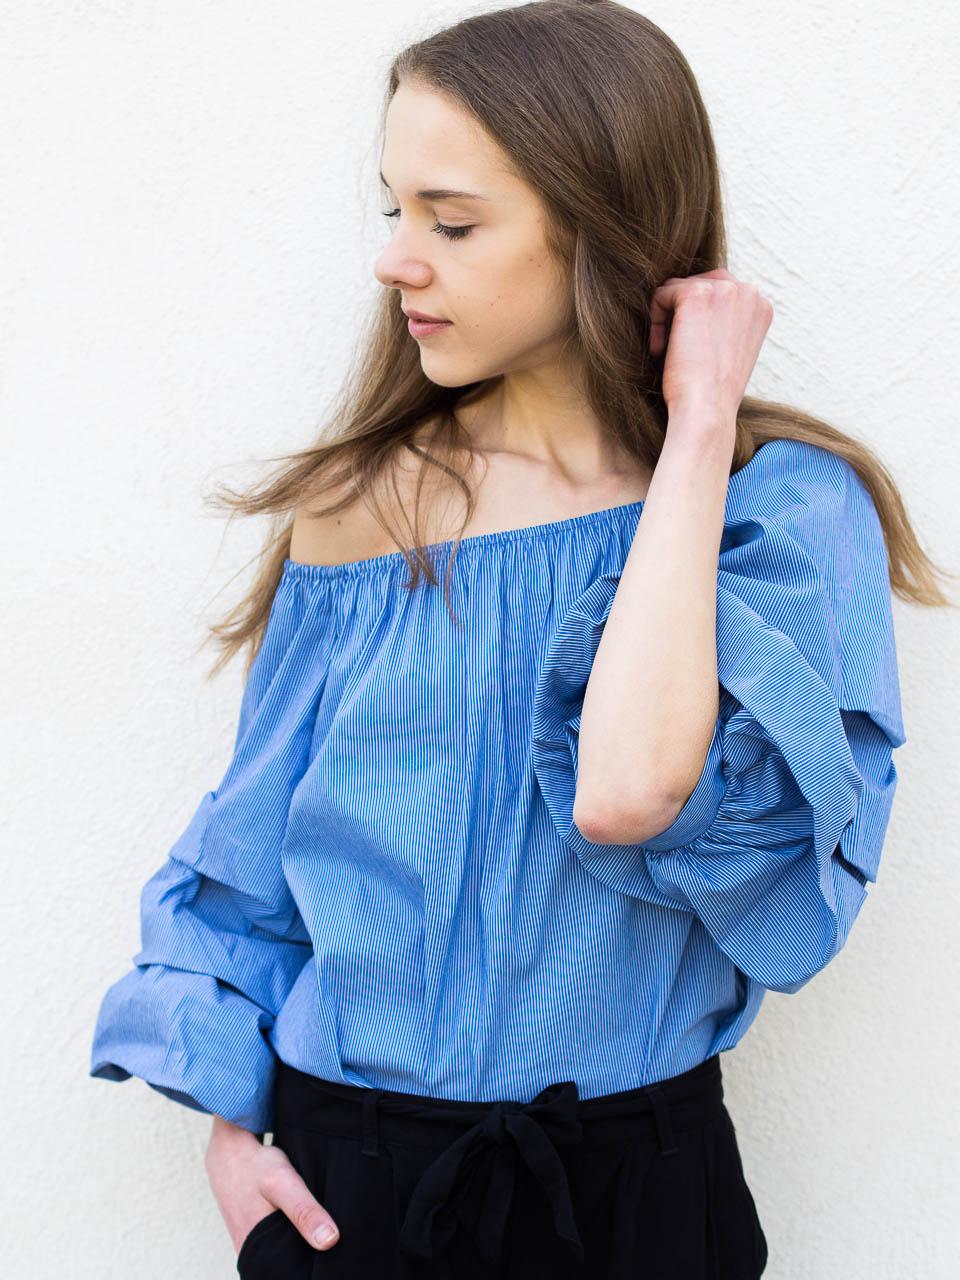 fashion-blogger-summer-style-staples-2018-bardot-top